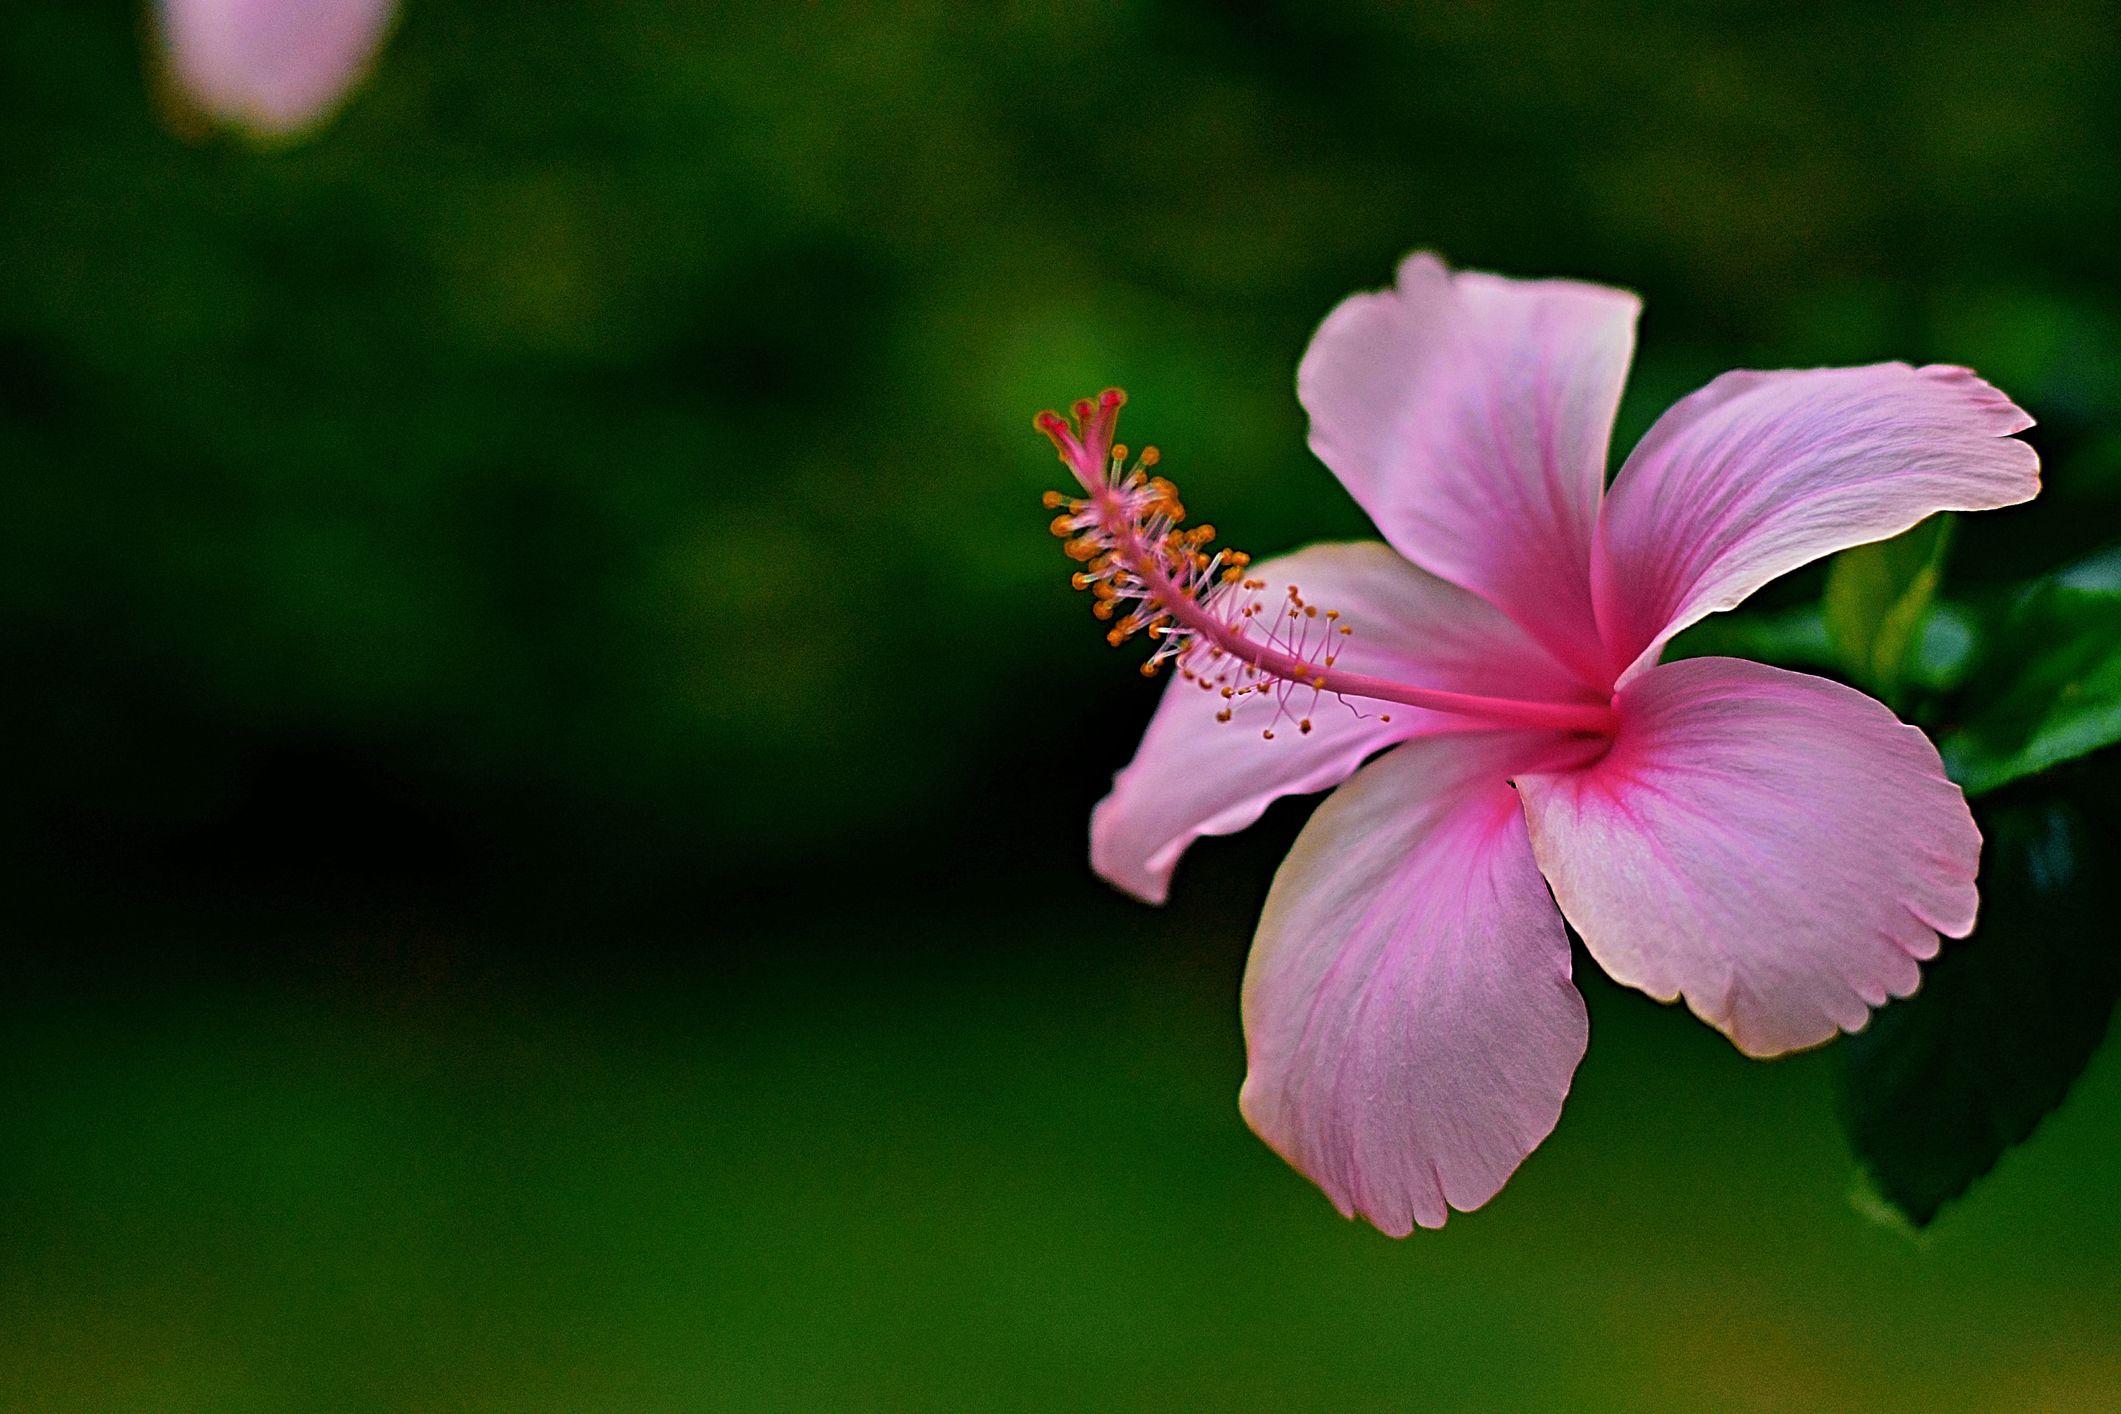 hibiscus-1520217326.jpg